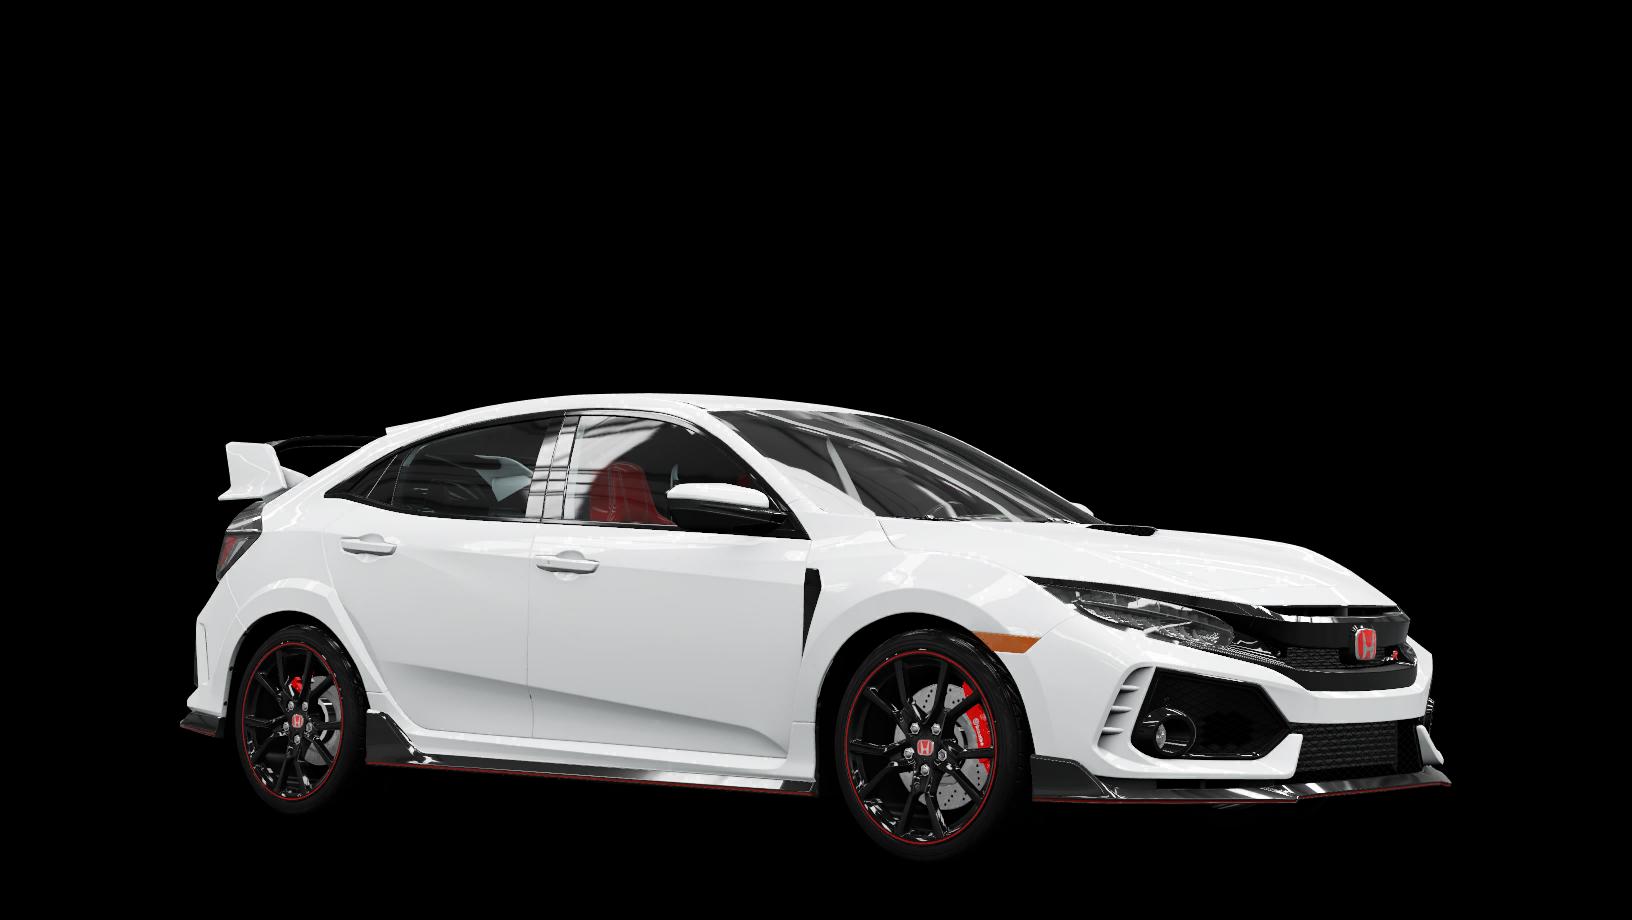 Honda Civic Type R (2018)